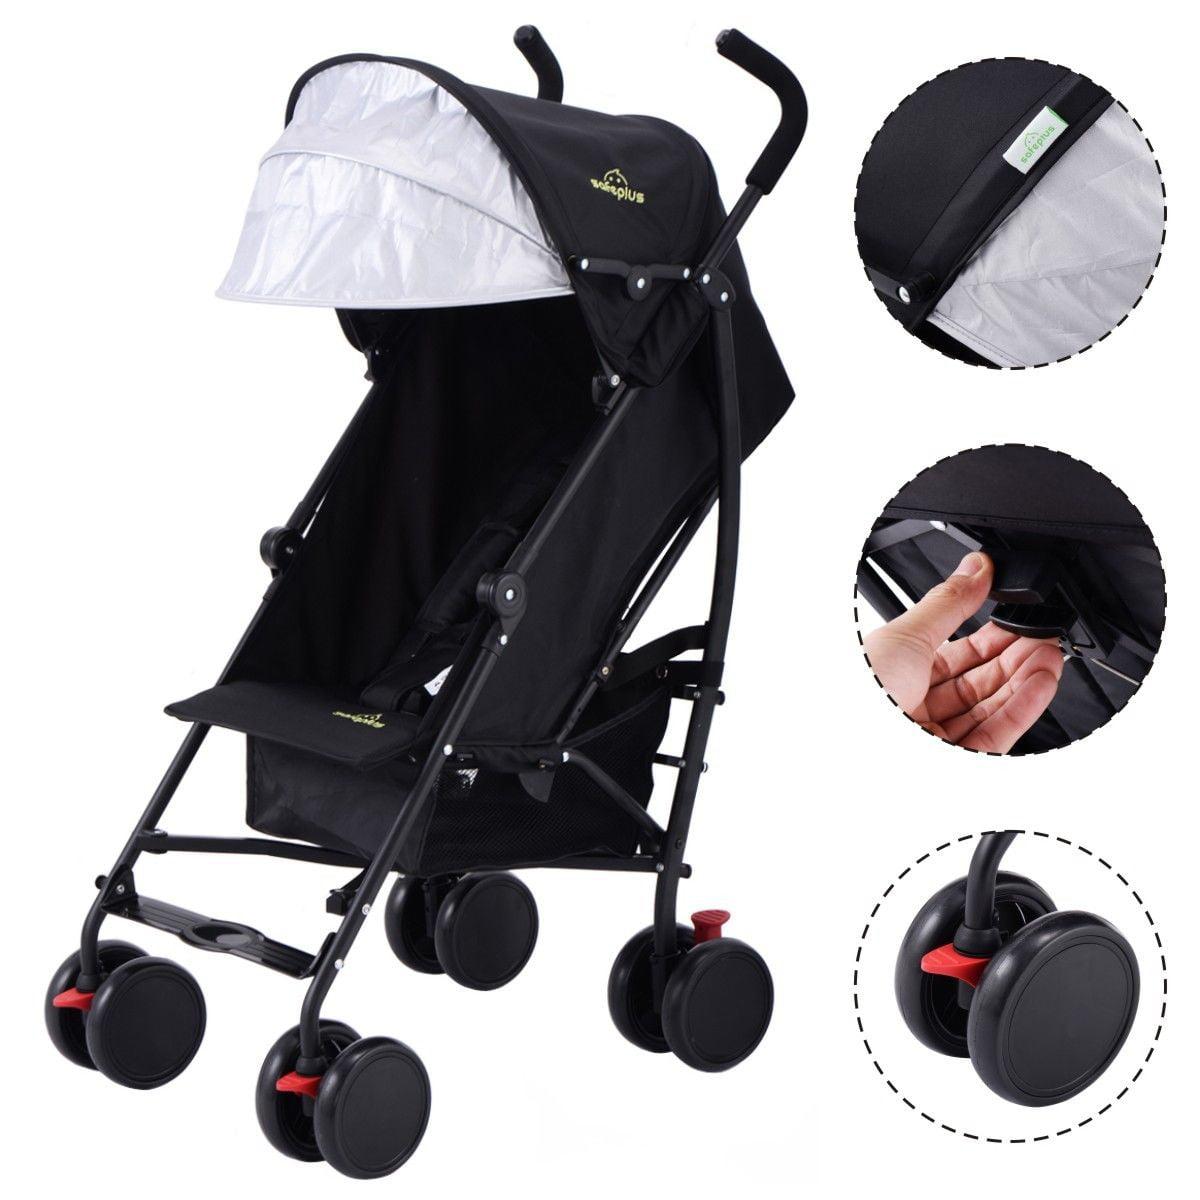 Lightweight Umbrella Stroller Baby Toddler Travel Canopy Hood Storage Basket by costway